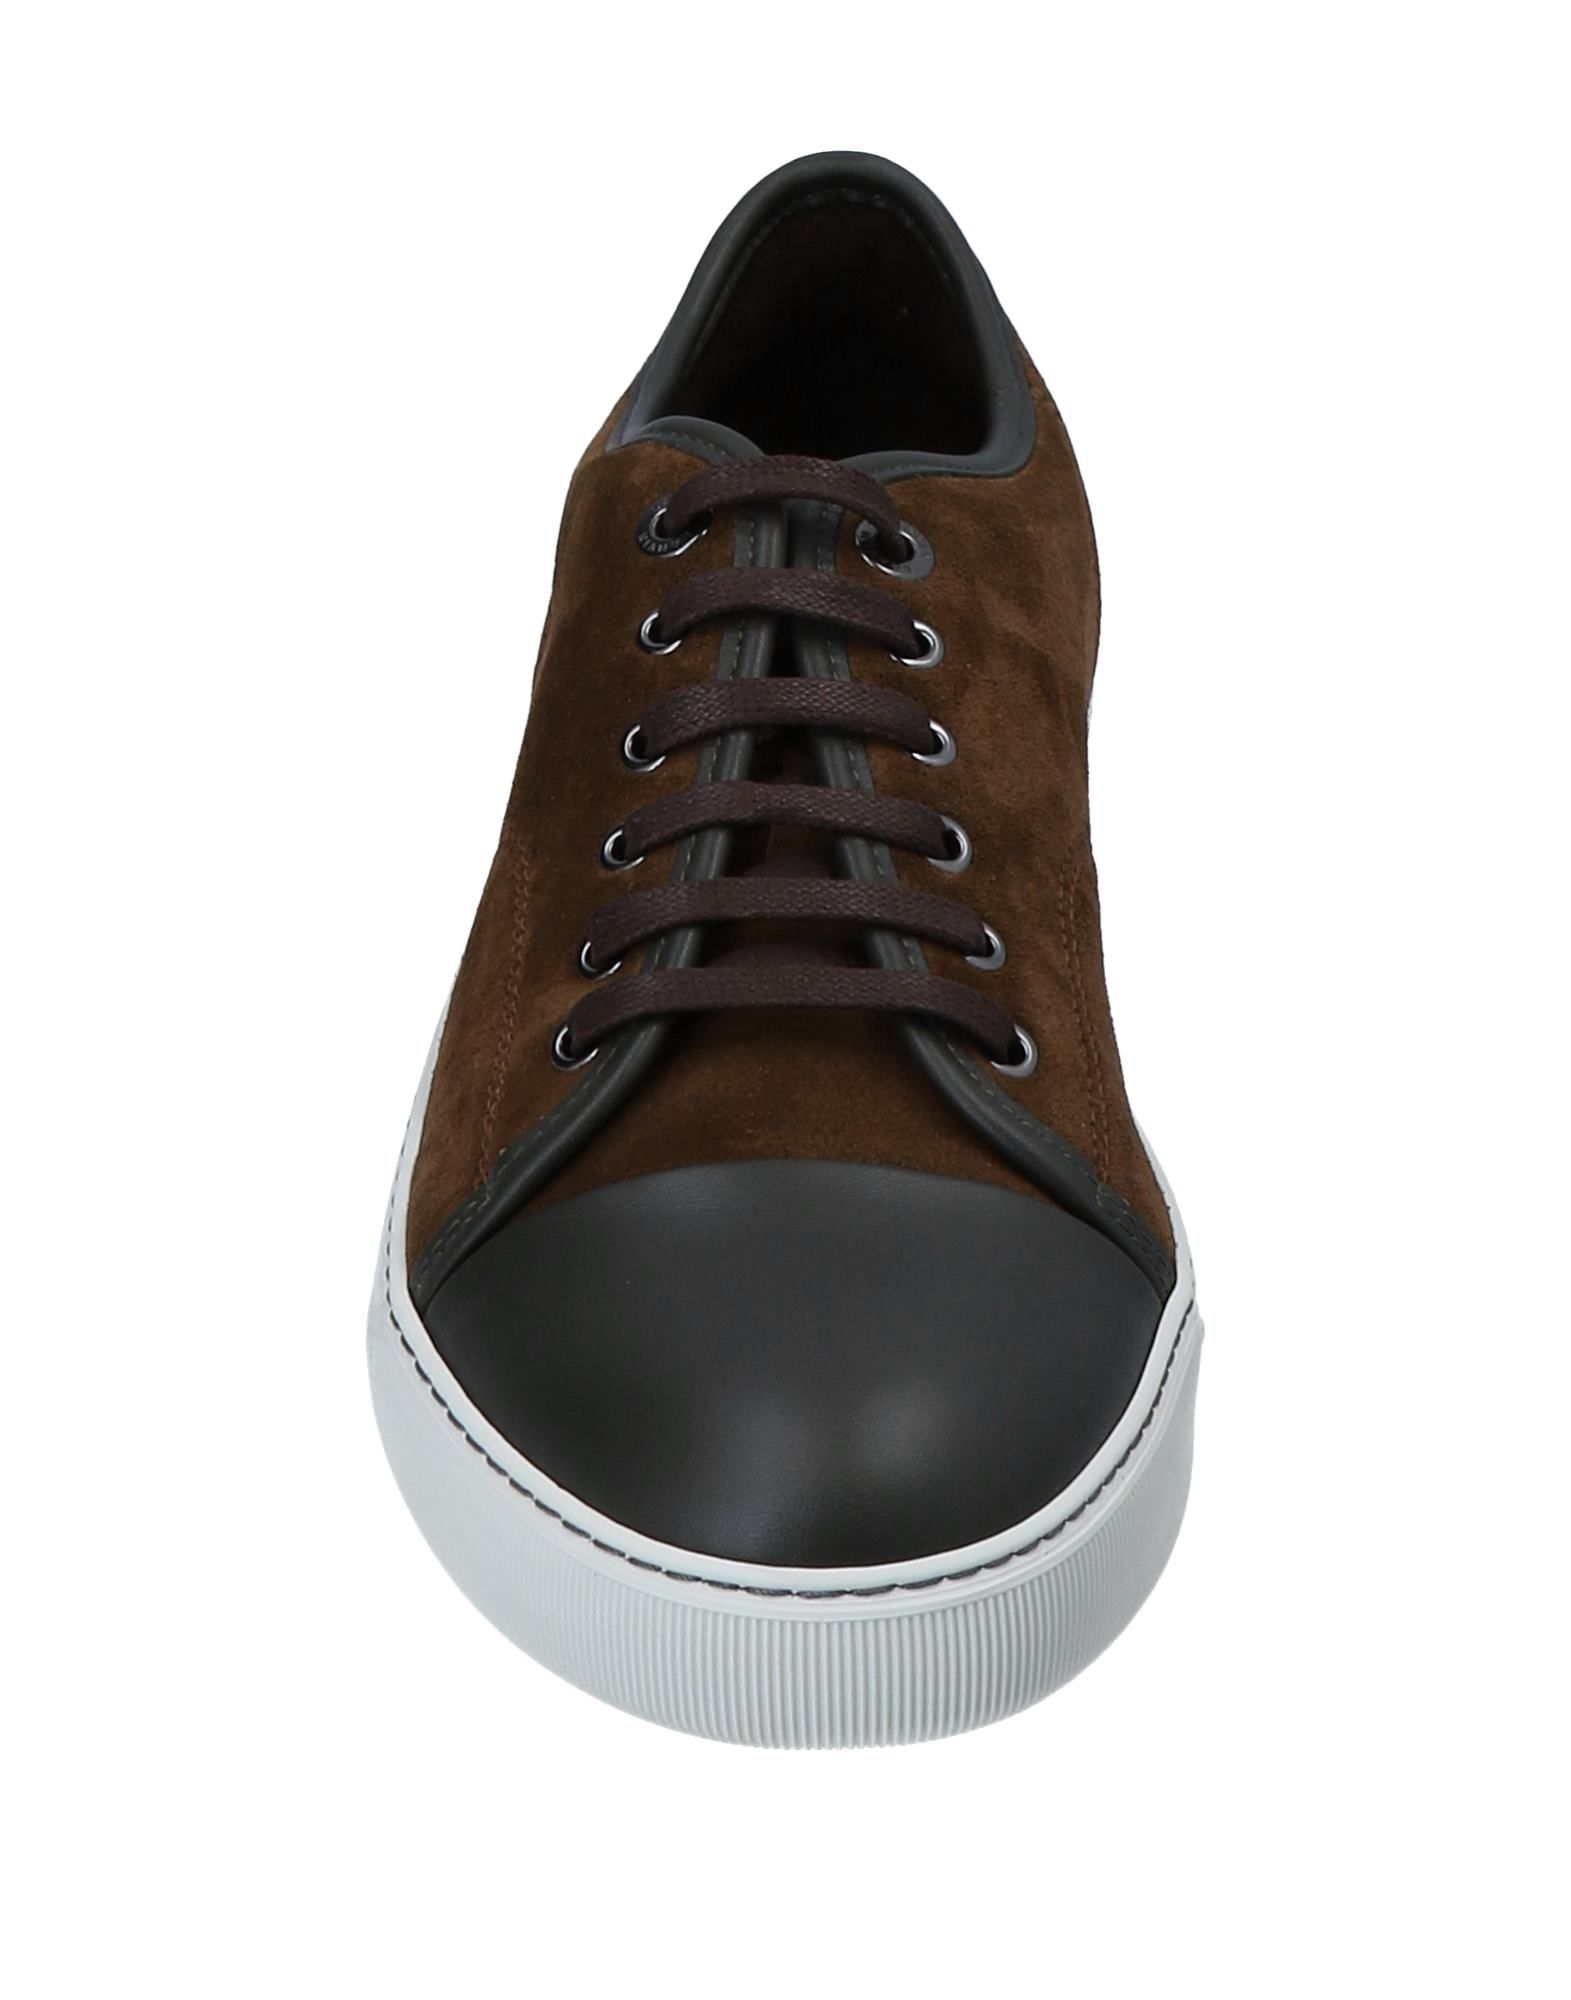 Lanvin Sneakers Herren beliebte  11556050LU Gute Qualität beliebte Herren Schuhe f1d5da